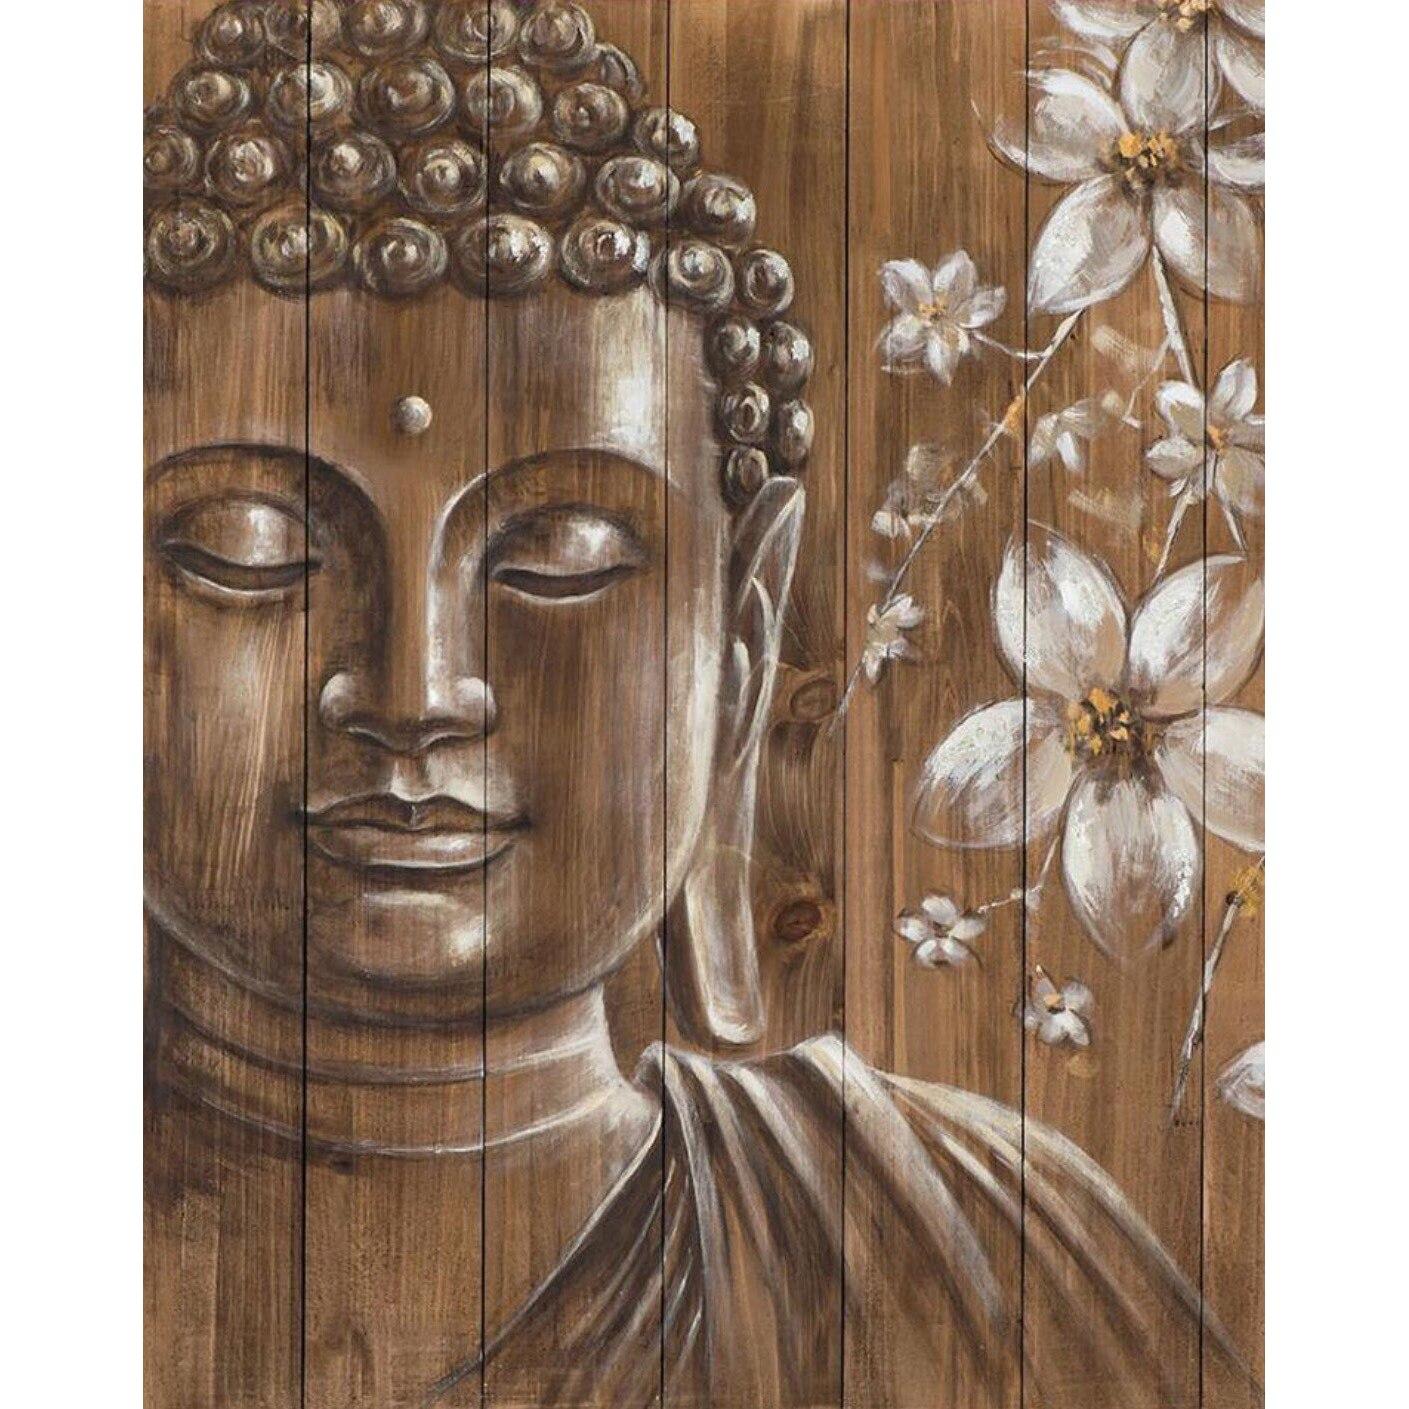 Buddha Full Square 5d Diy Diamond Painting Mosaic